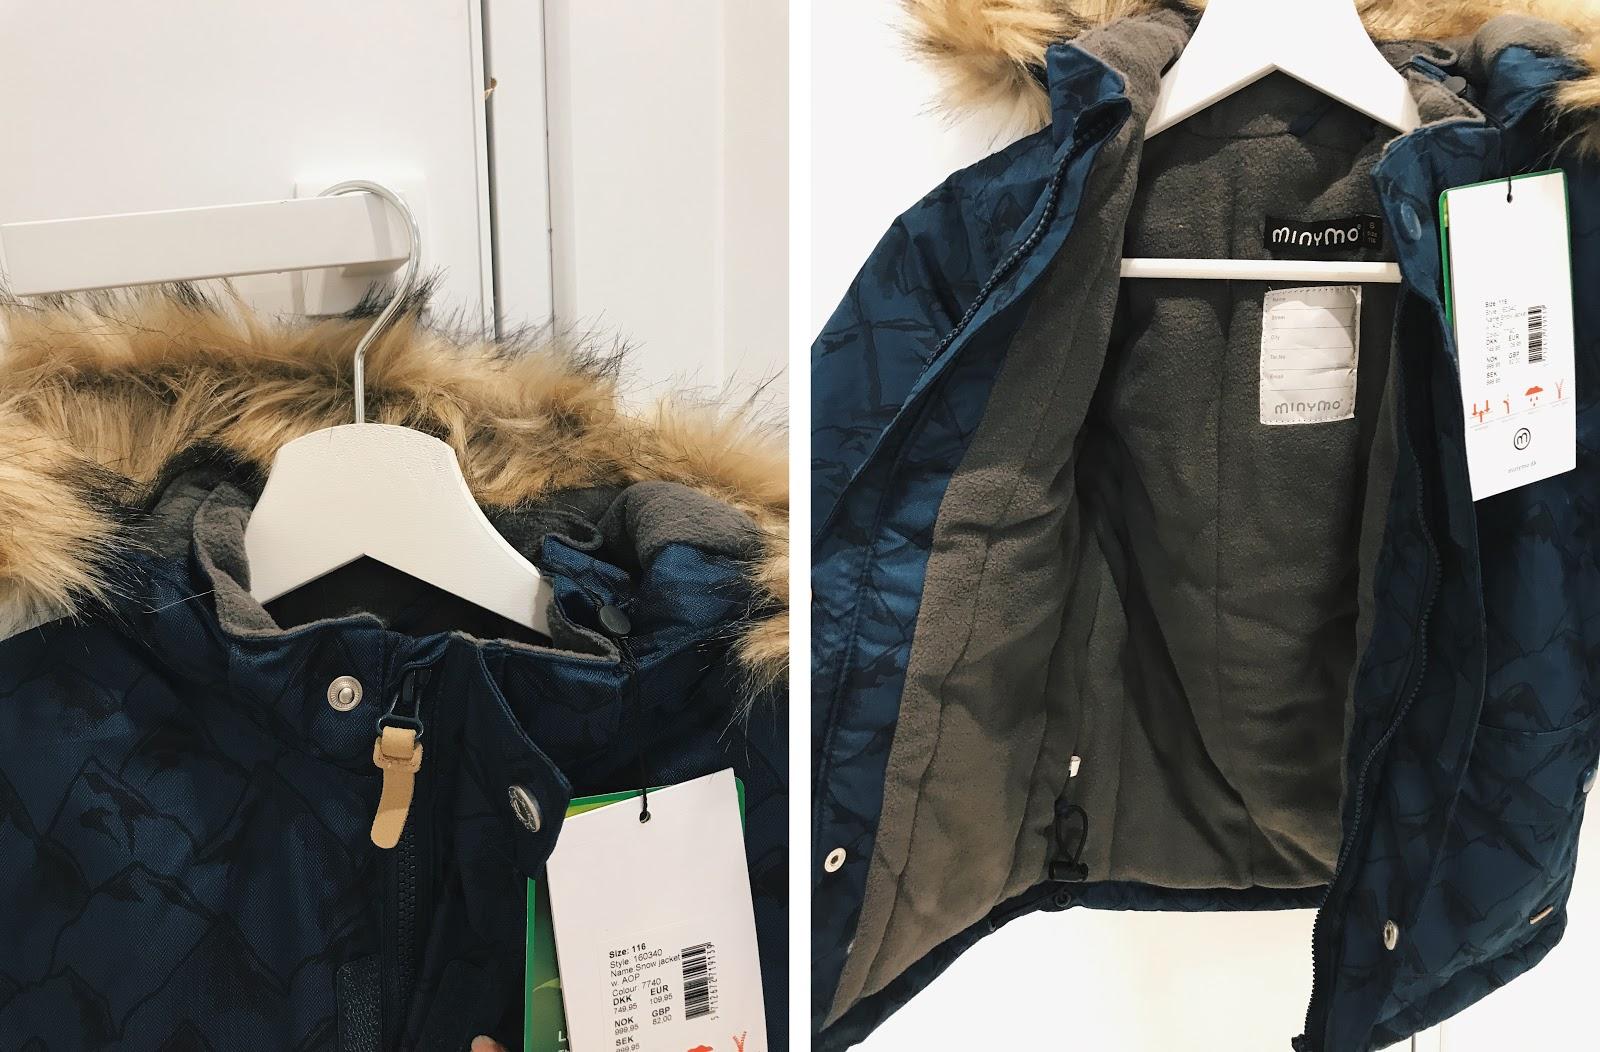 MINYMO  Blue Wing Teal Mountain Jacket куртка отзывы обзор